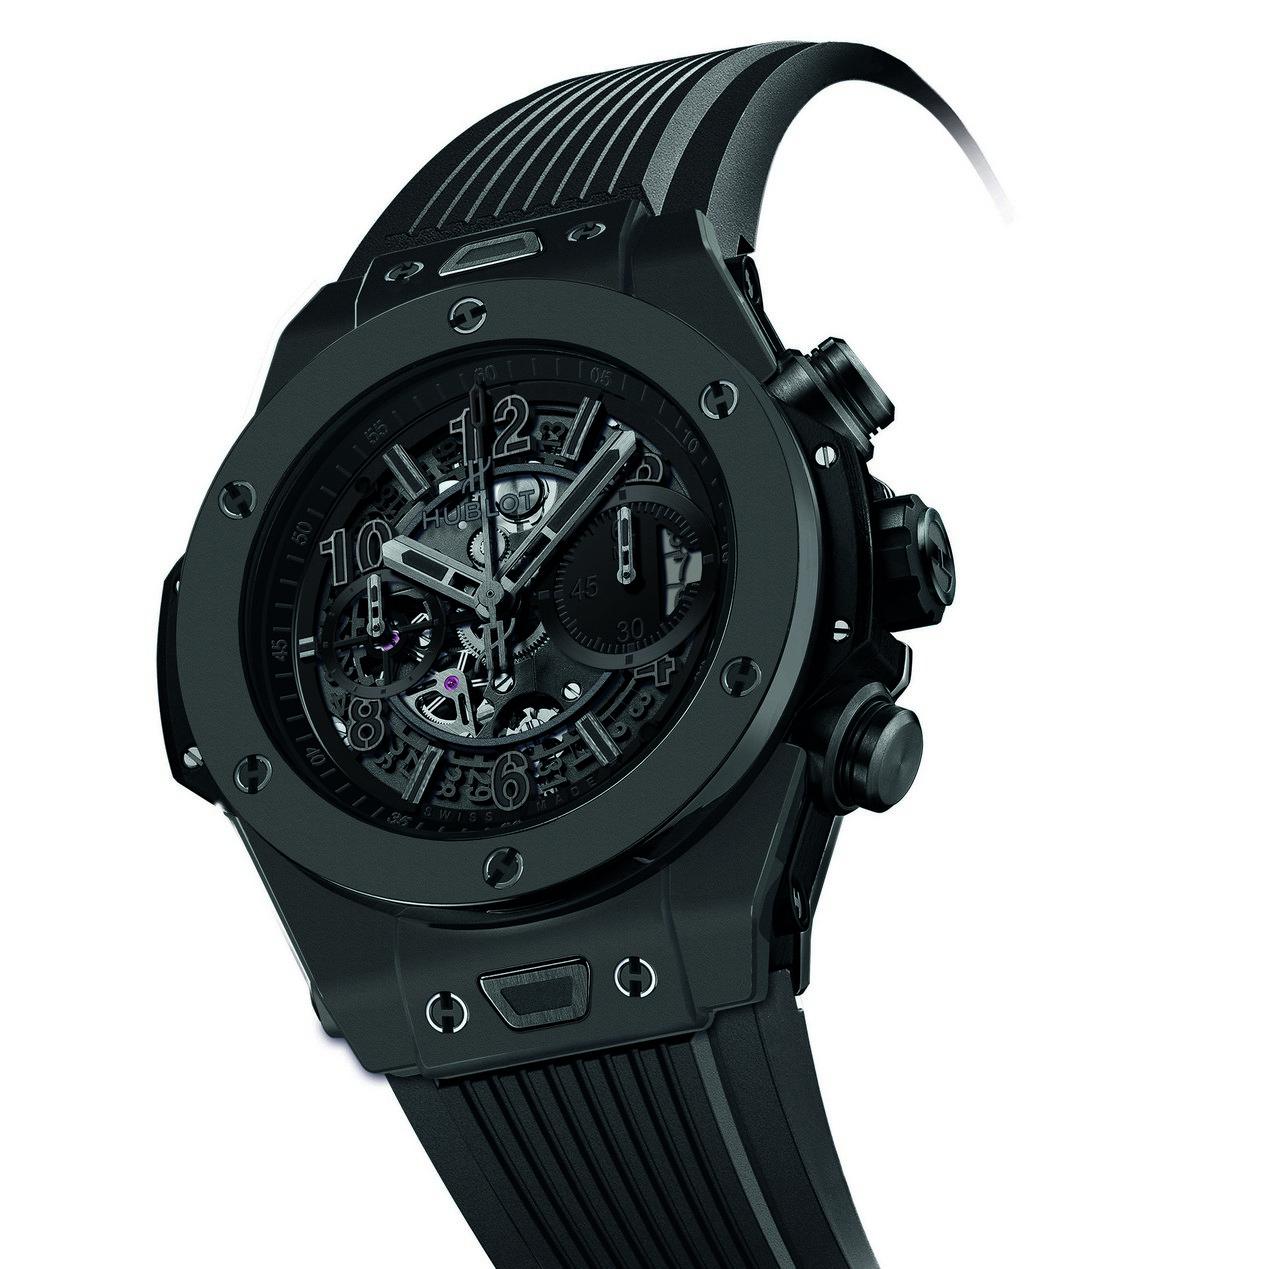 sihh-2014-hublot-big-bang-unico-all-black-limited-edition_0-100_2